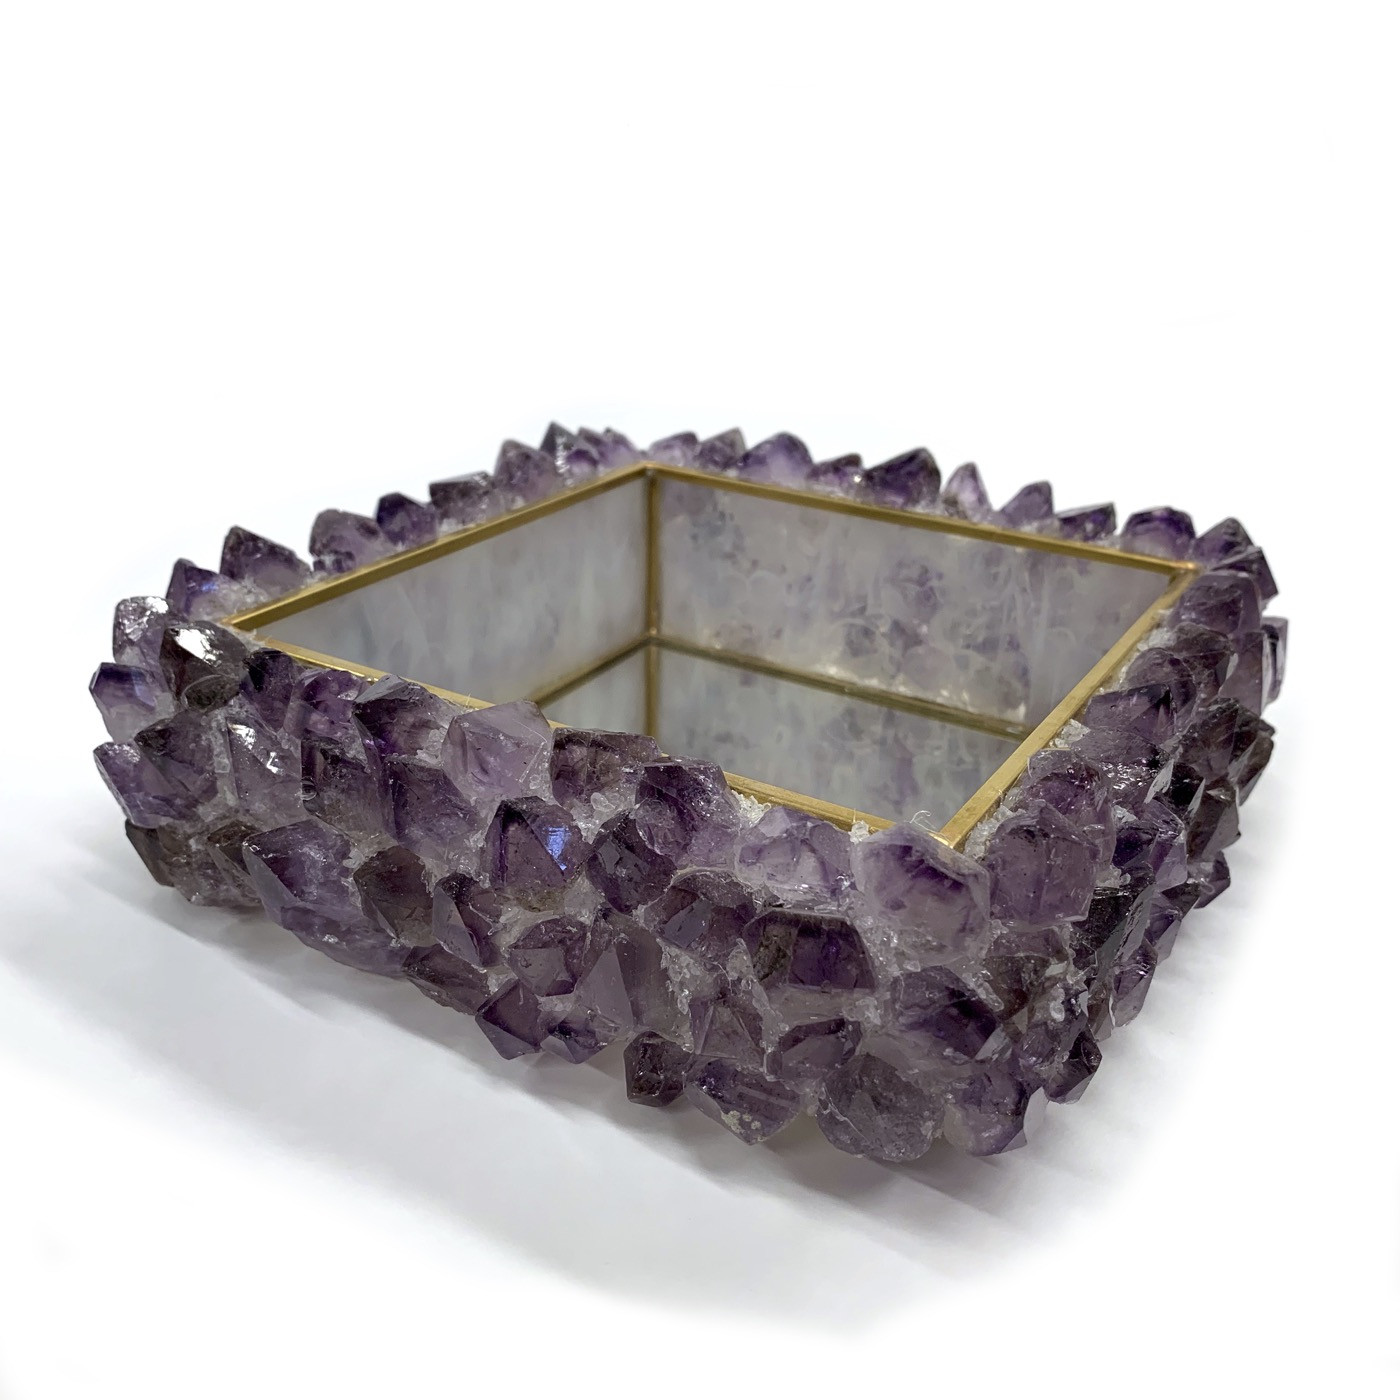 Maraba Mirrored Trays | Amethyst